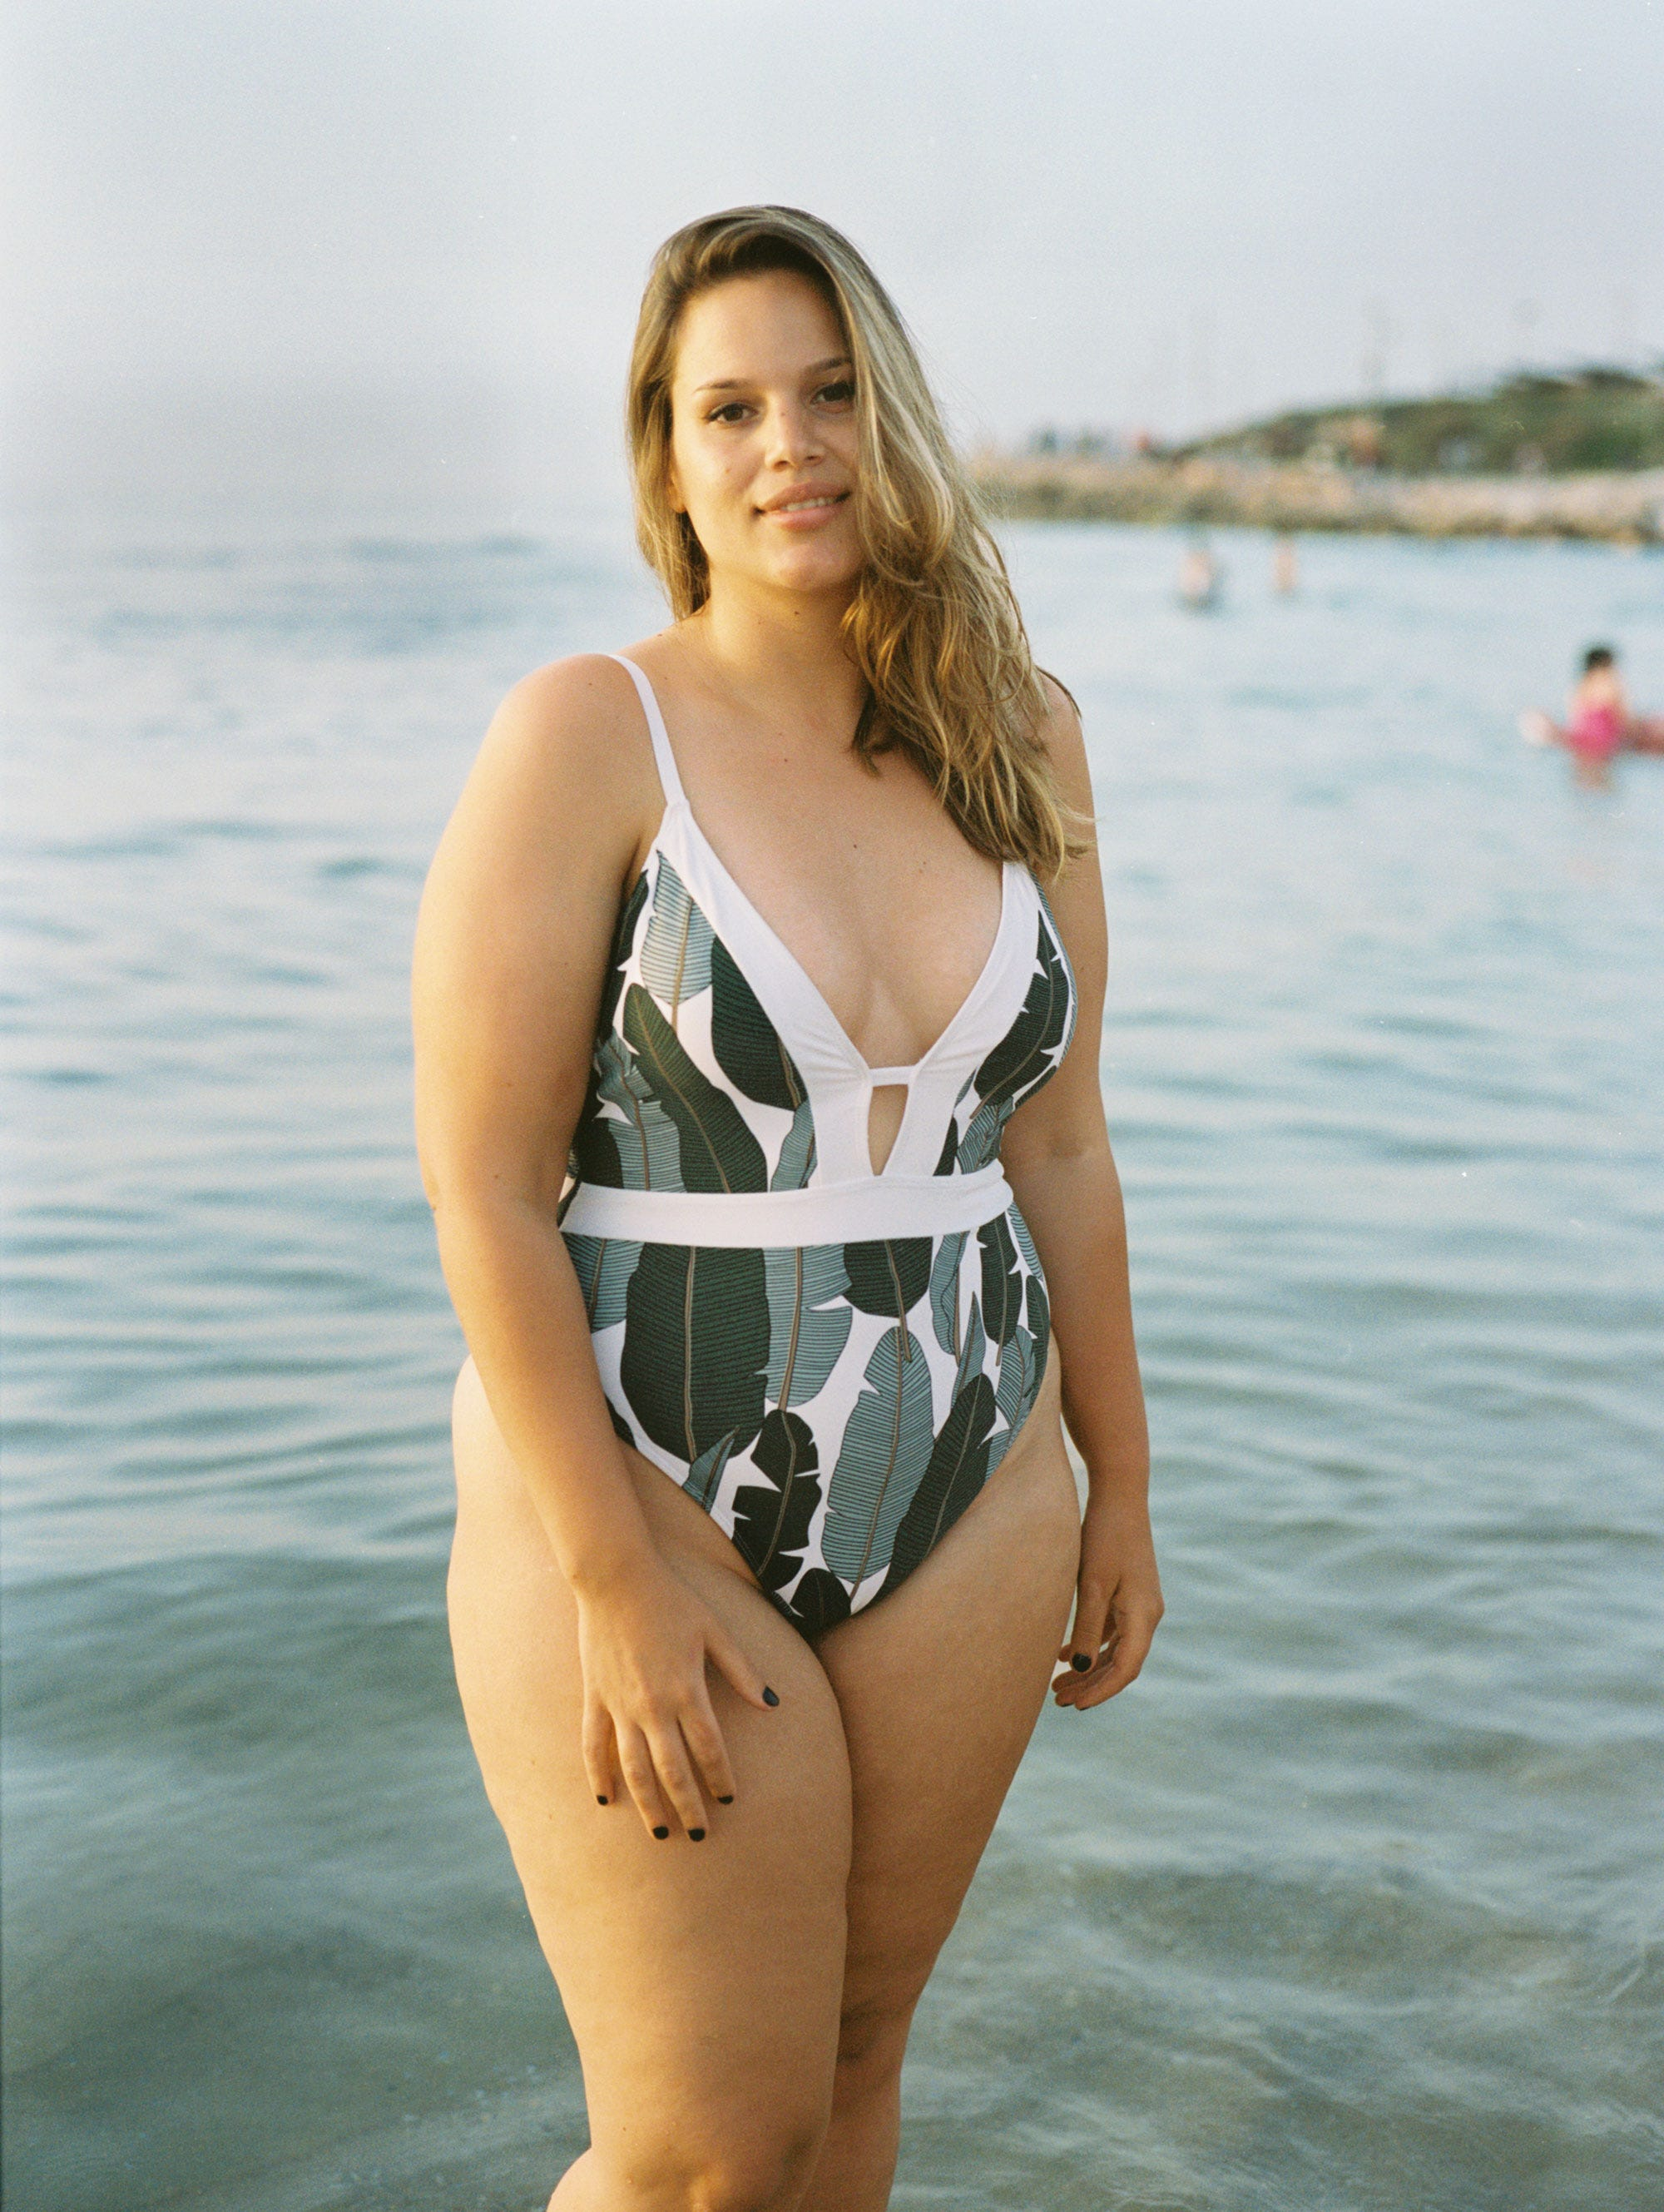 Beach Figure Female Real Photos Israeli Body Women LjSVGUzqMp